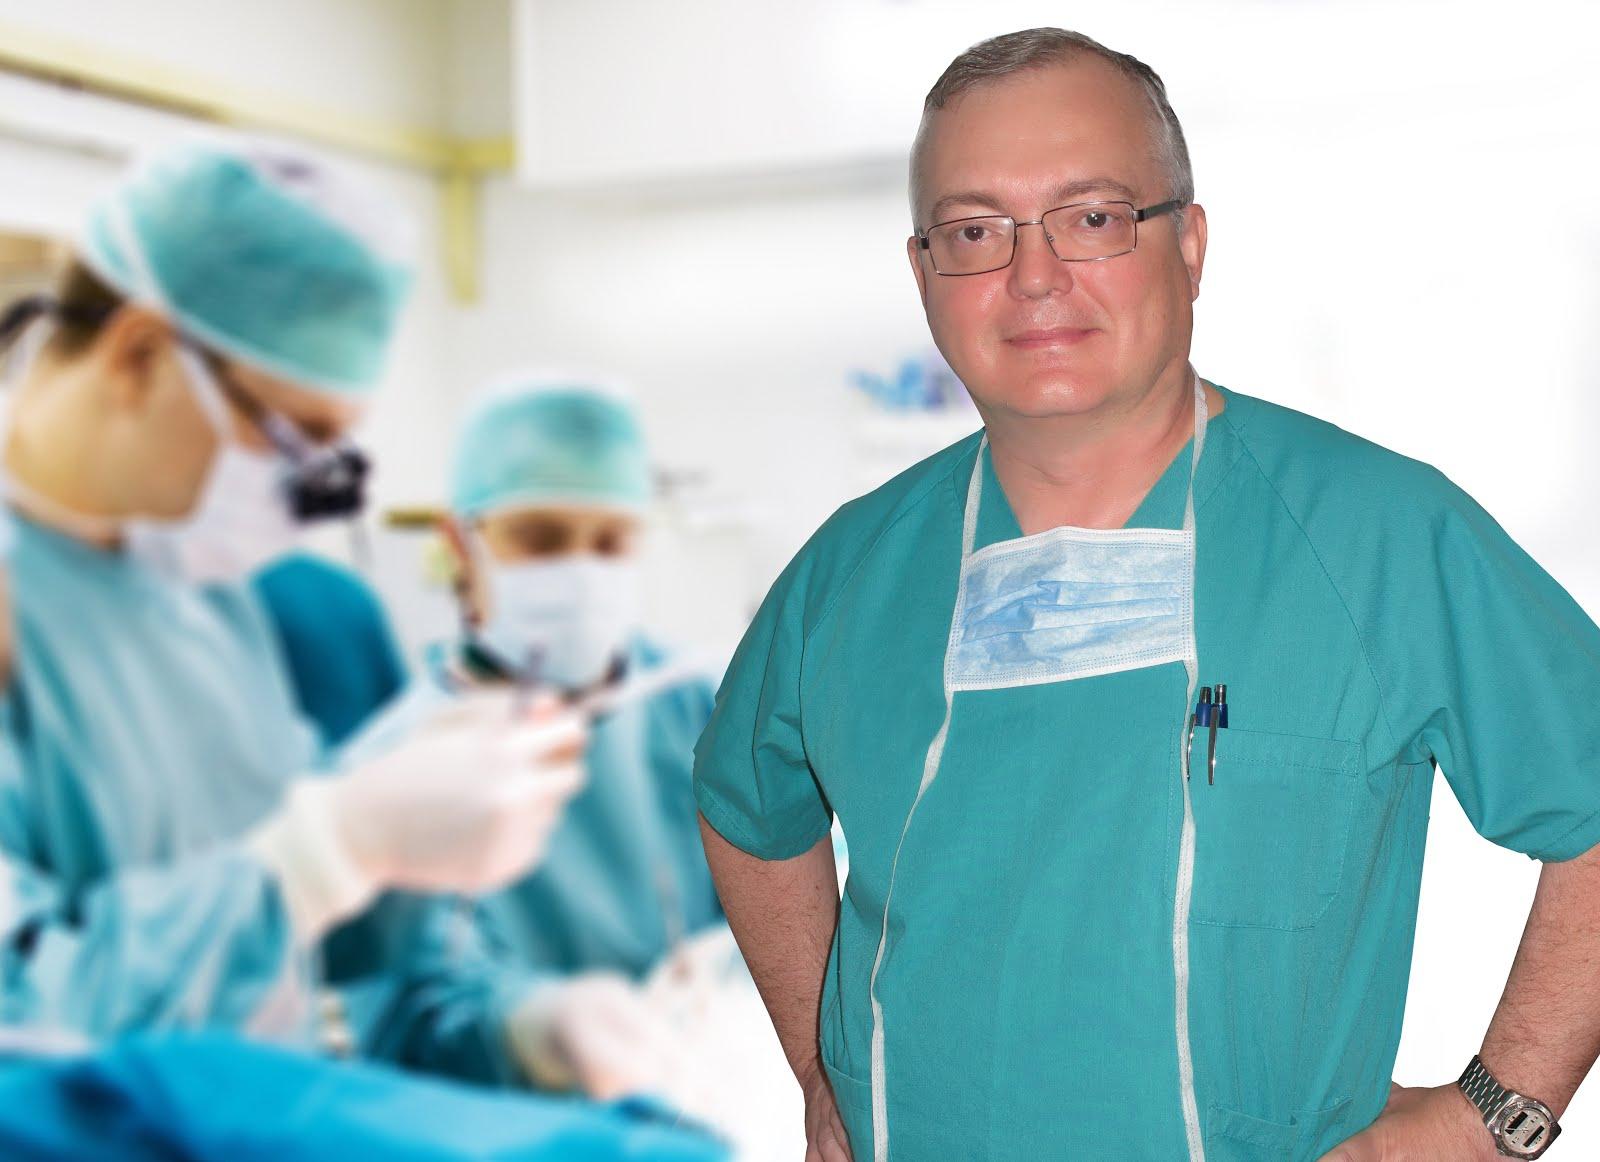 DOCTOR EMILIO J. SALMERON MARTINEZ